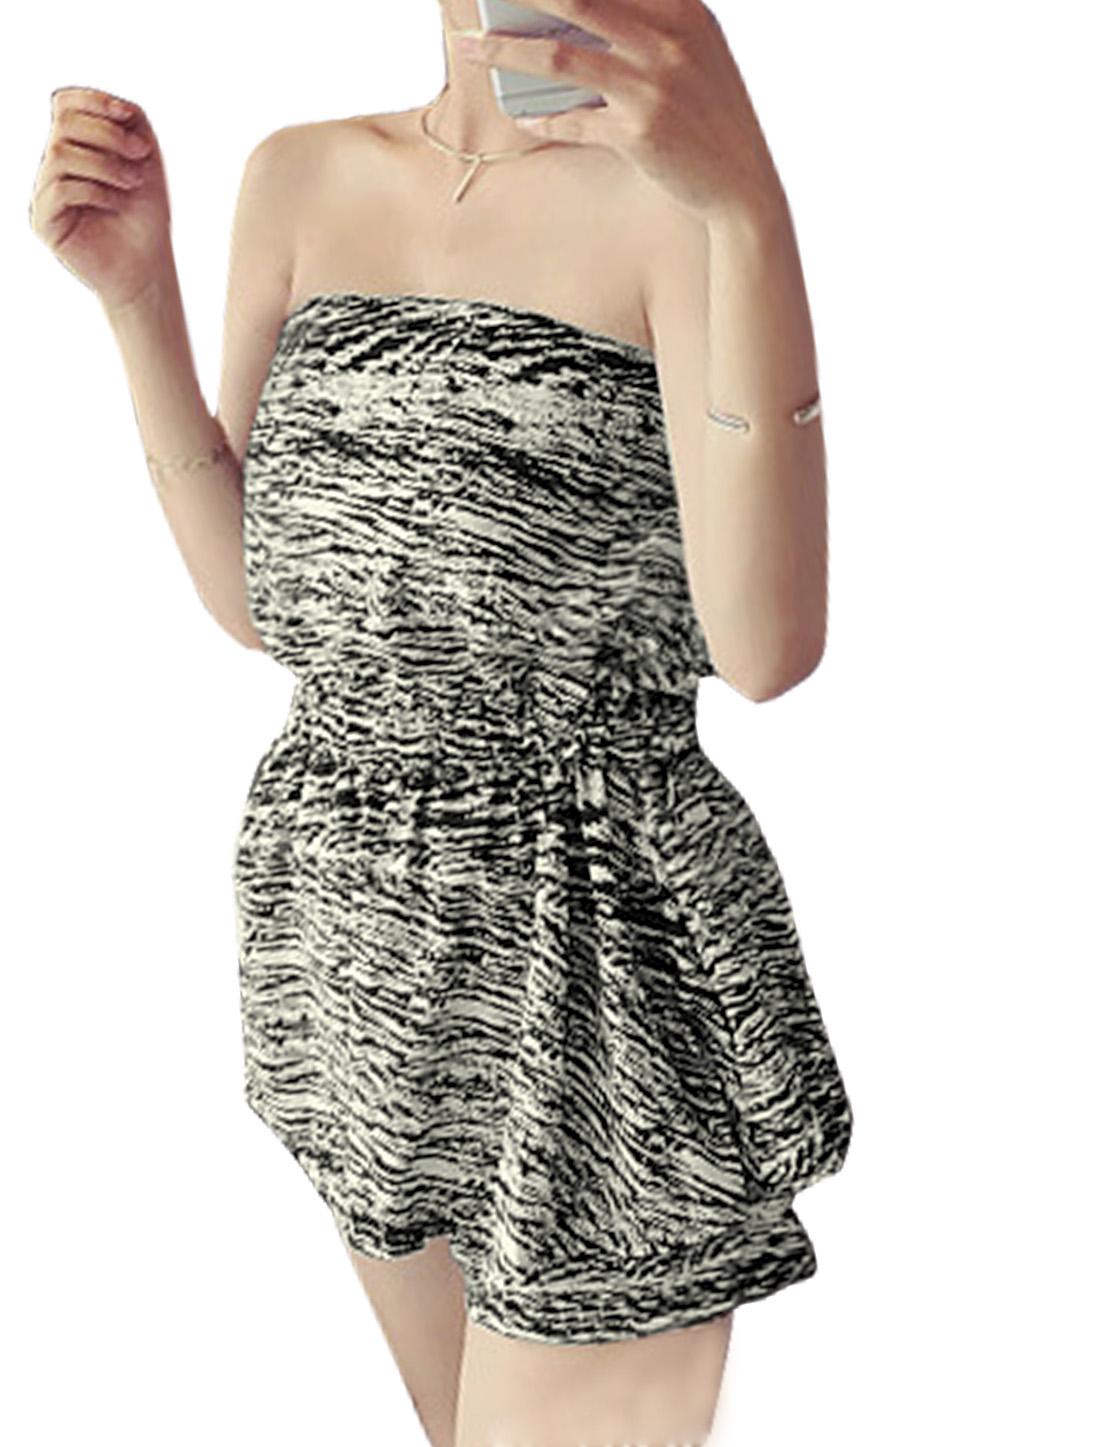 Women Strapless Layered Novelty Prints Leisure Romper Black White XS